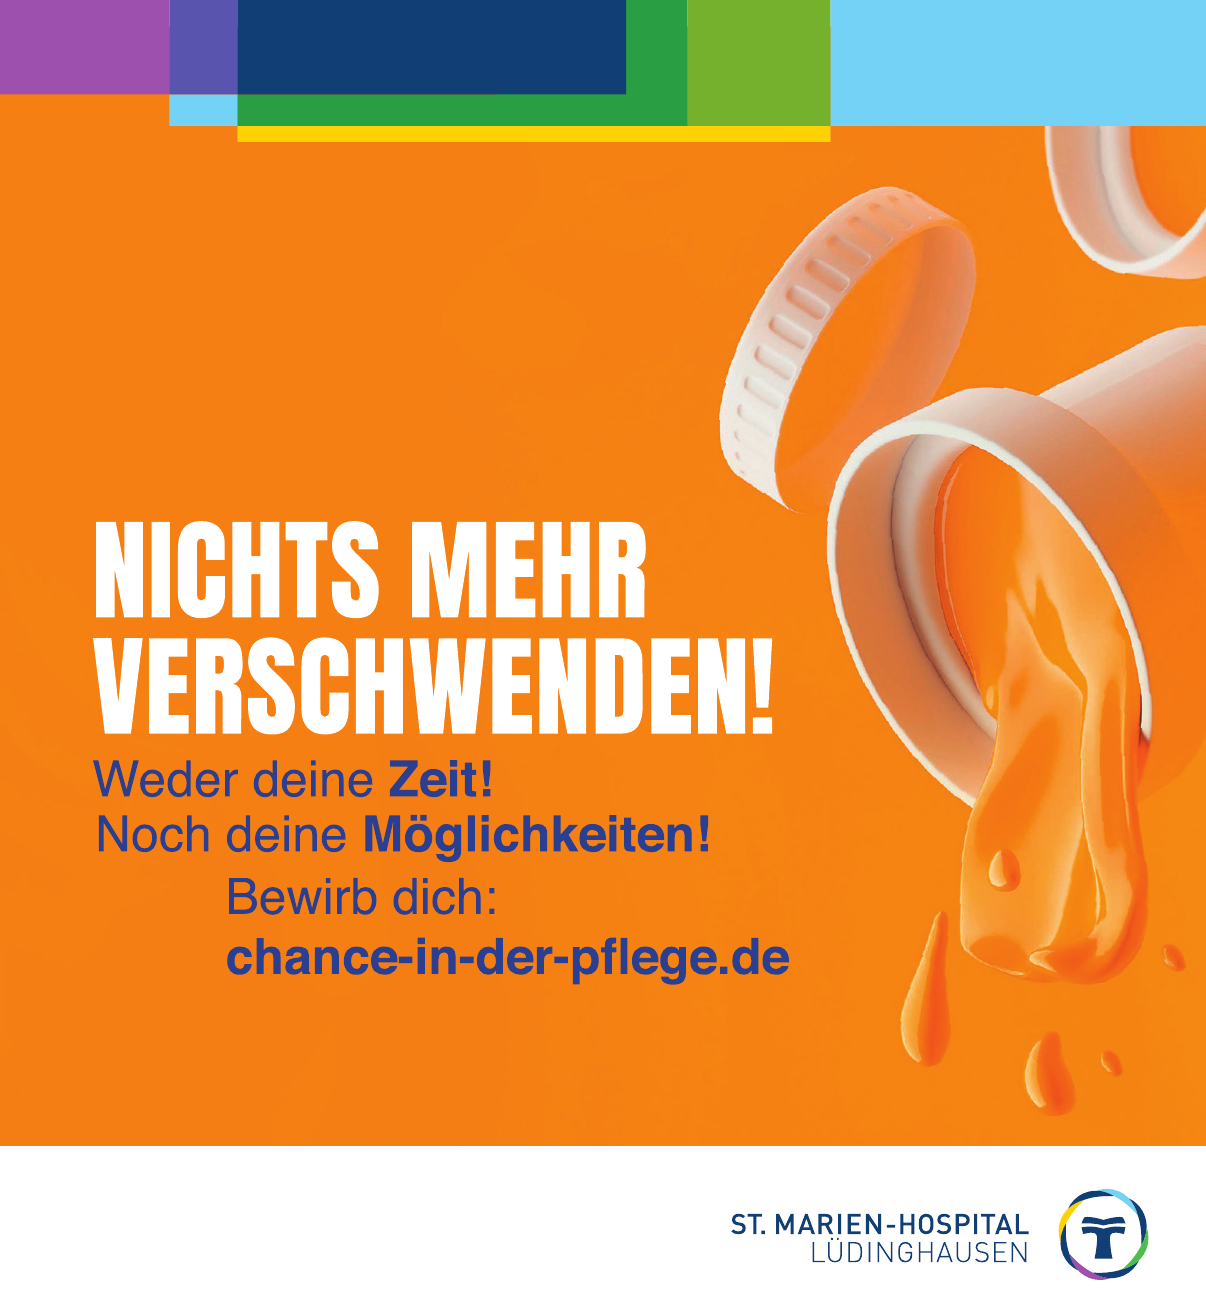 St. Marien-Hospital Lüdinghausen GmbH